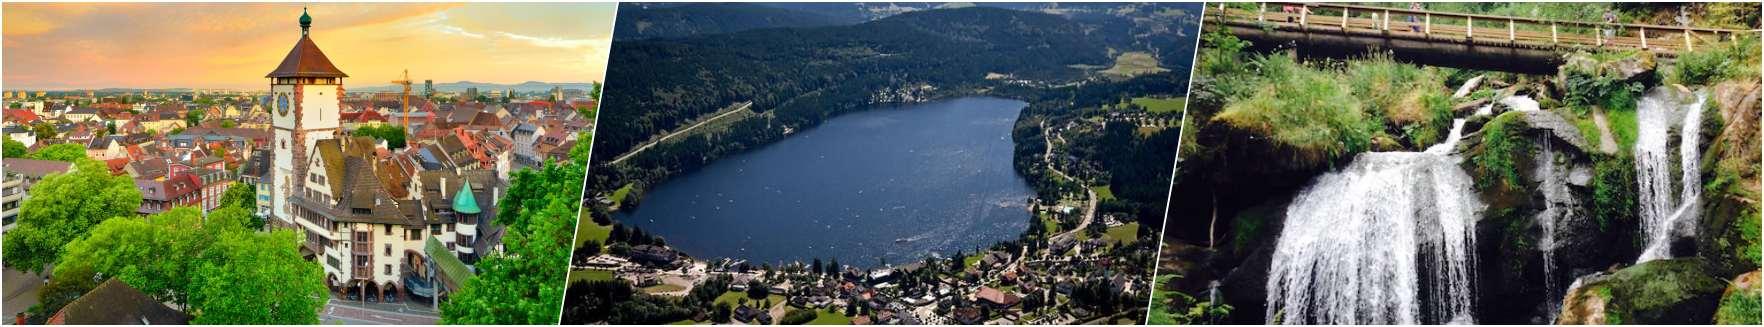 Freiburg - Titisee Lake - Triberg